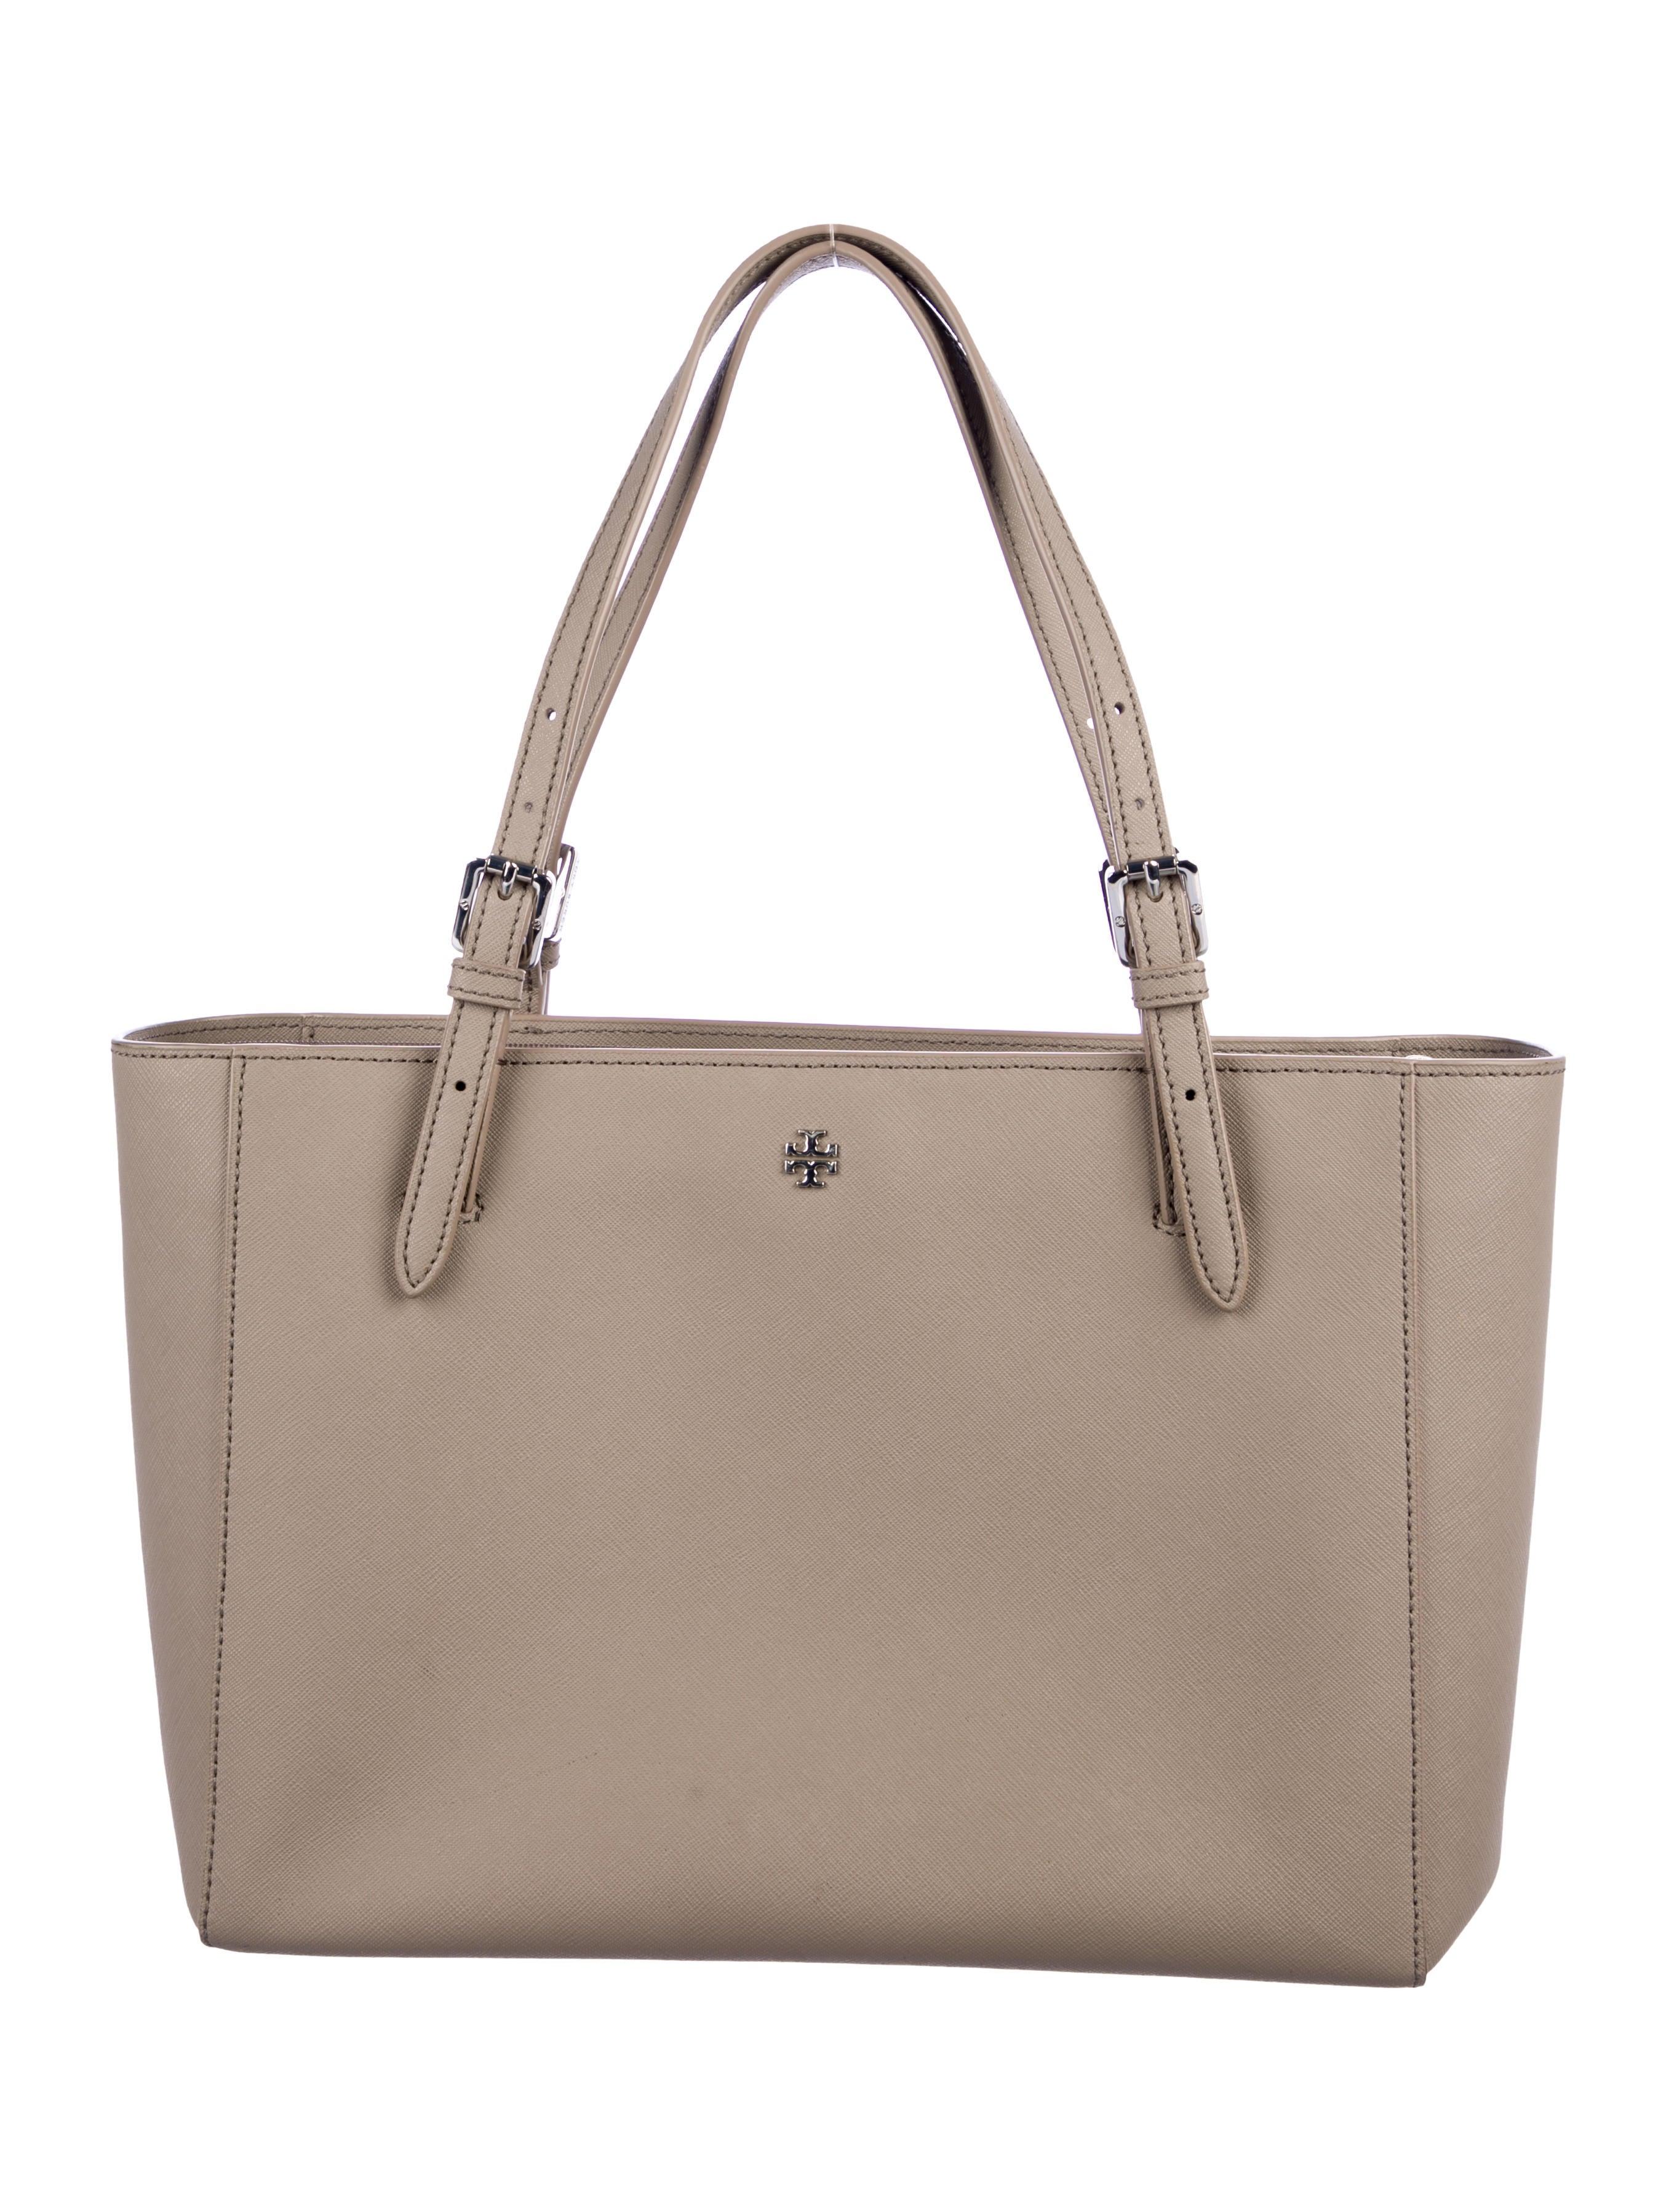 c832e000f5d Tory Burch Small York Buckle Tote - Handbags - WTO162717